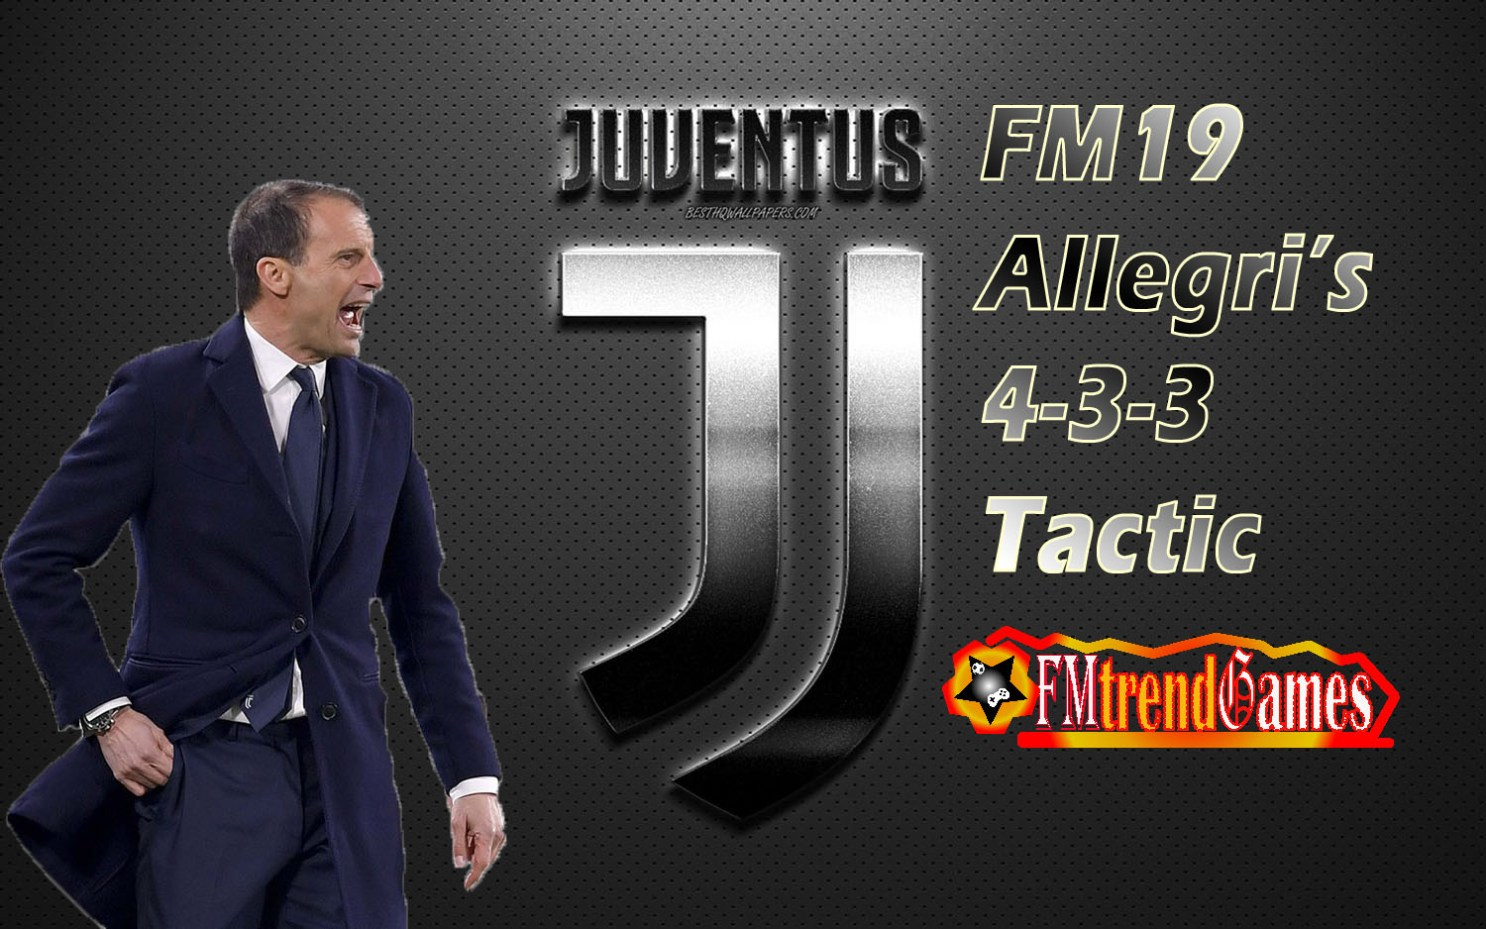 FM19 Allegri's 4-3-3 Tactic at Juventus FC | FMtrendGames